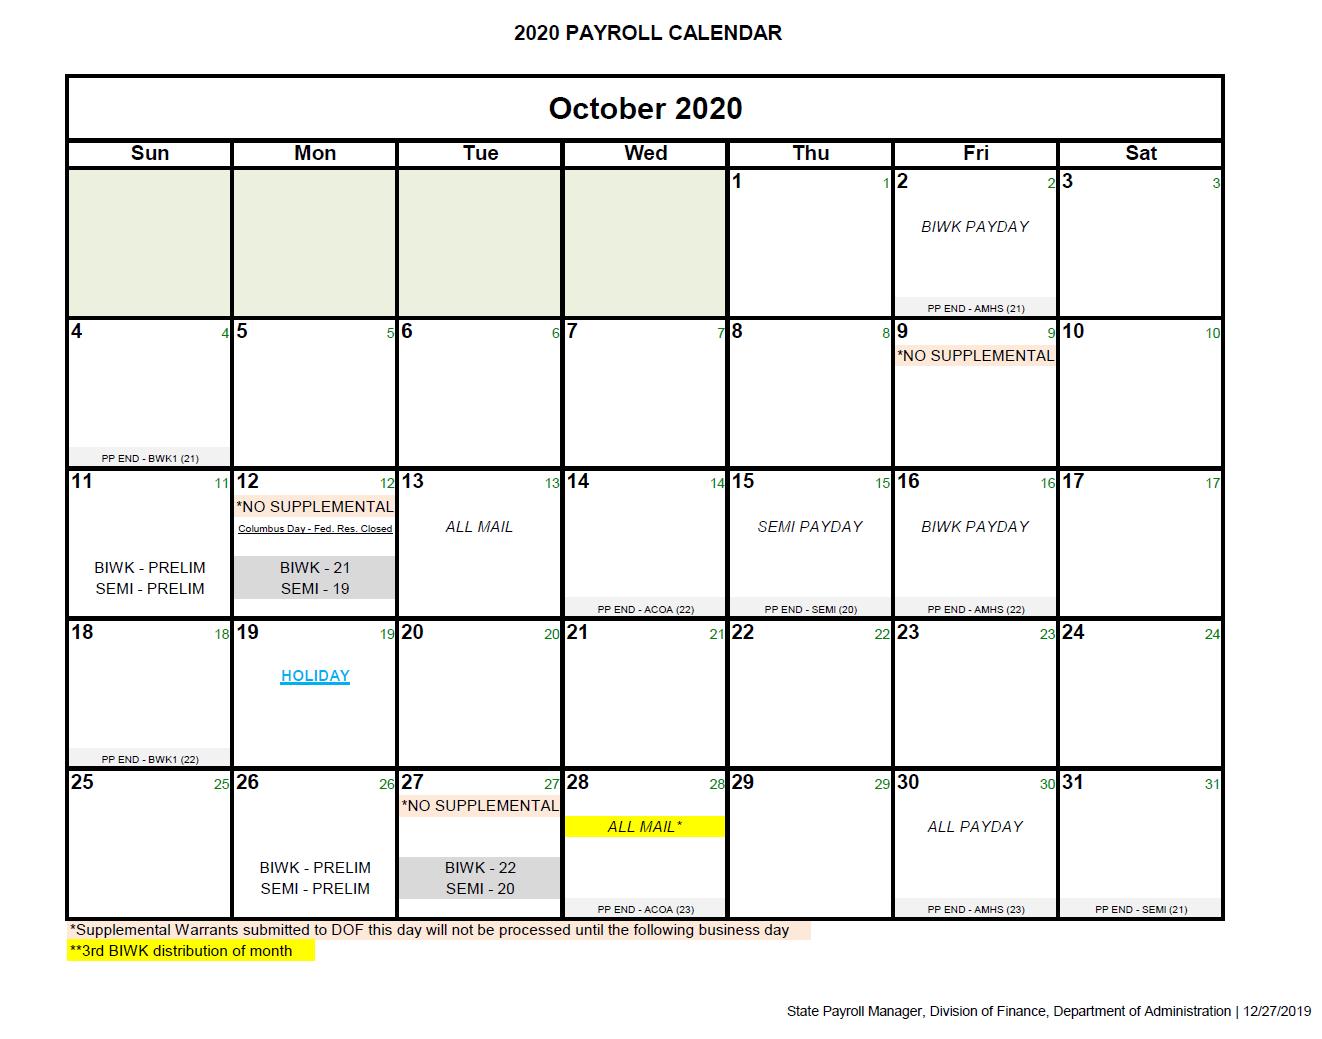 2021 Period Calendar : Federal Pay Period Calendar 2020  Federal Government Pay Period Chart Or 2021